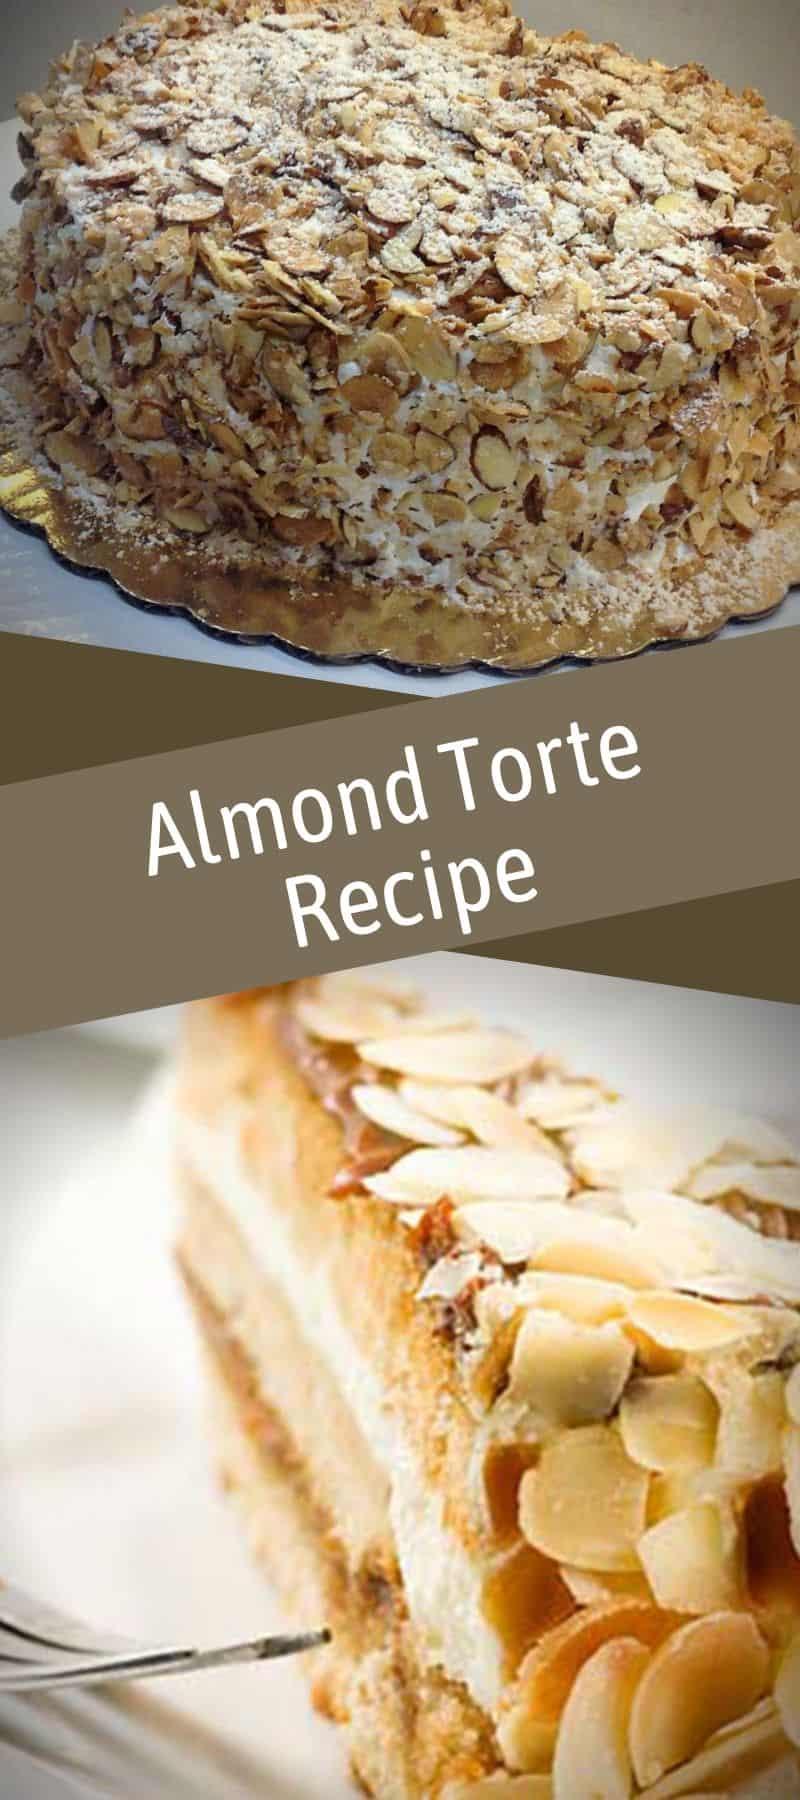 Almond Torte Recipe 3